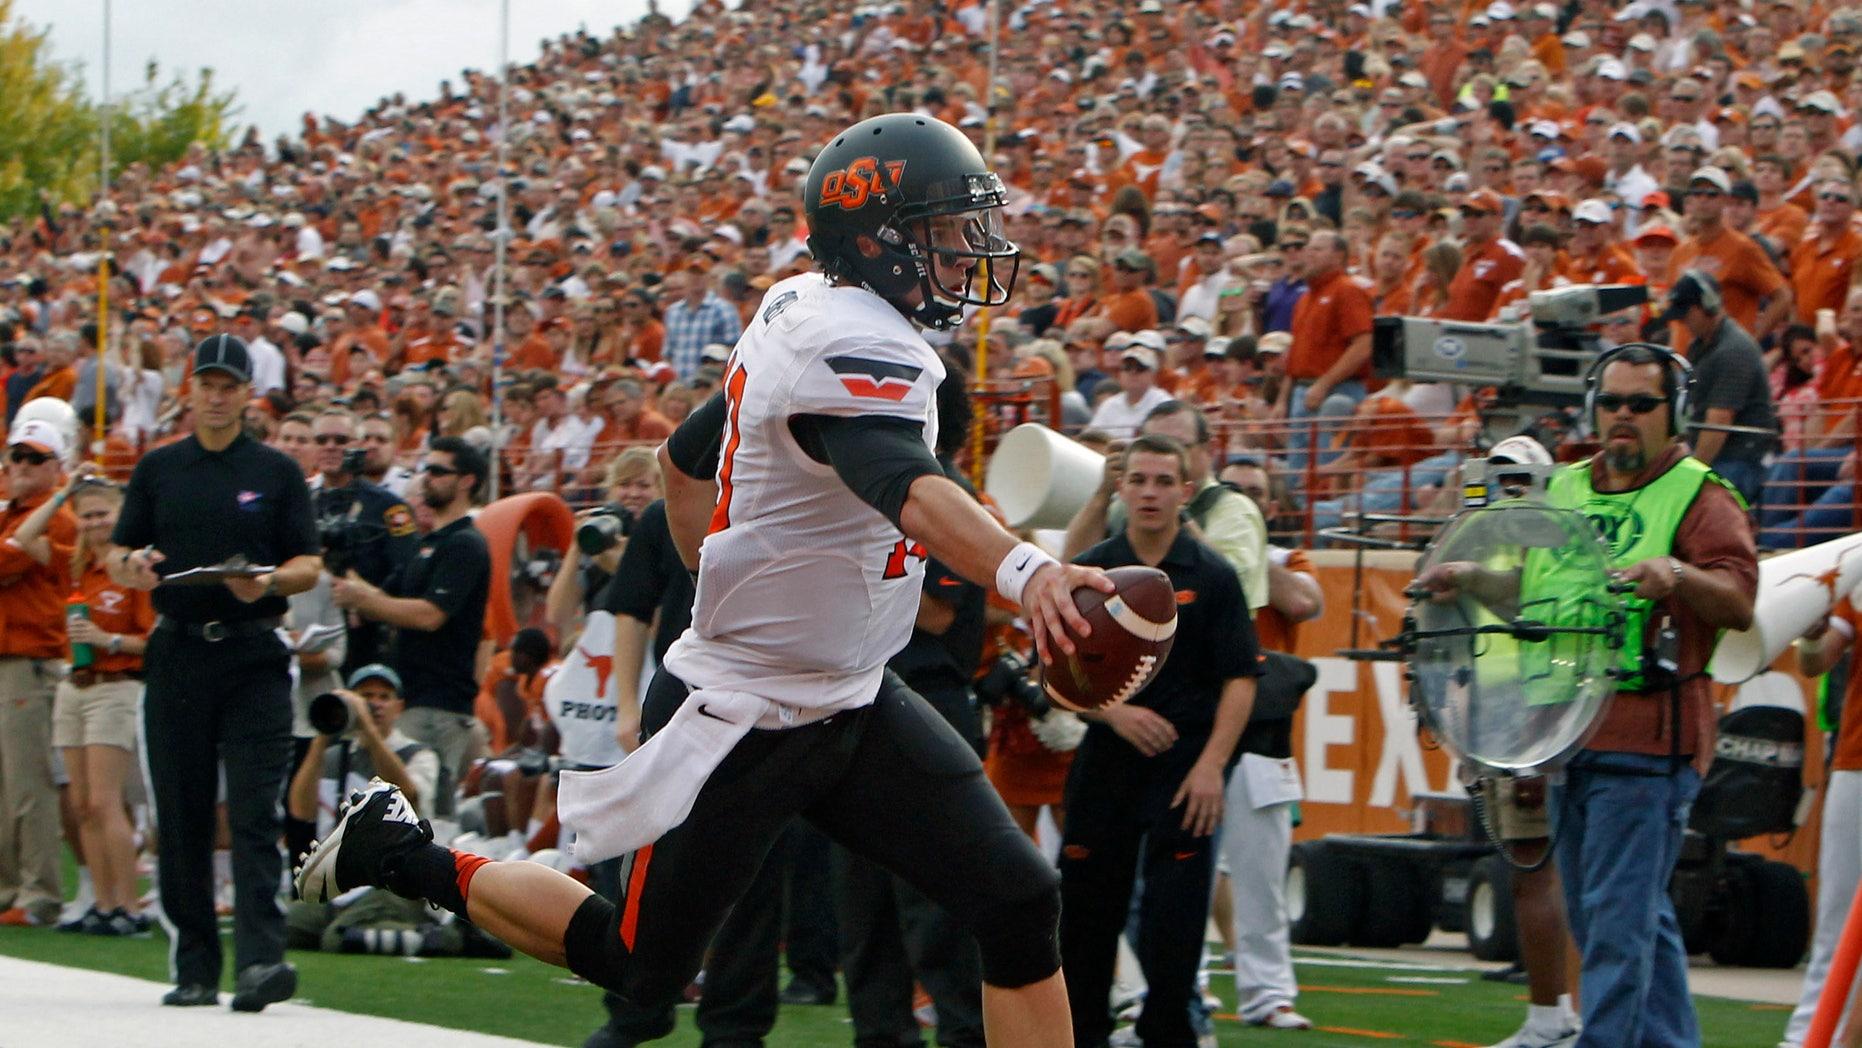 Oklahoma State quarterback Clint Chelf scores a touchdown against Texas during the second quarter of an NCAA college football game Saturday, Nov. 16, 2013, in Austin, Texas. (AP Photo/Michael Thomas)